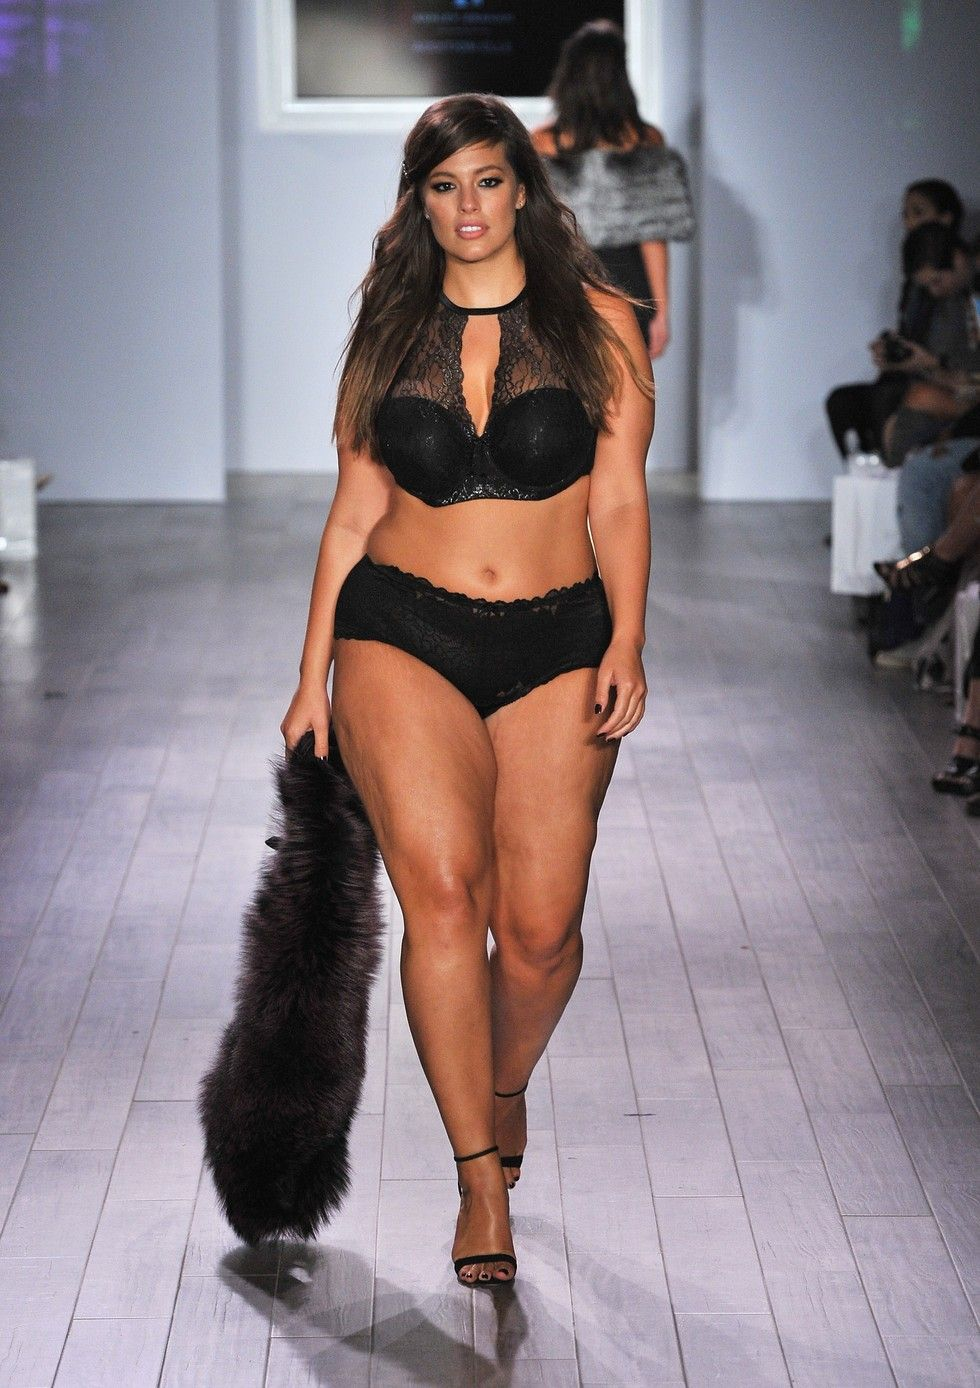 Plus-Size Supermodel Ashley Graham Shows Her Lingerie Line On The ...